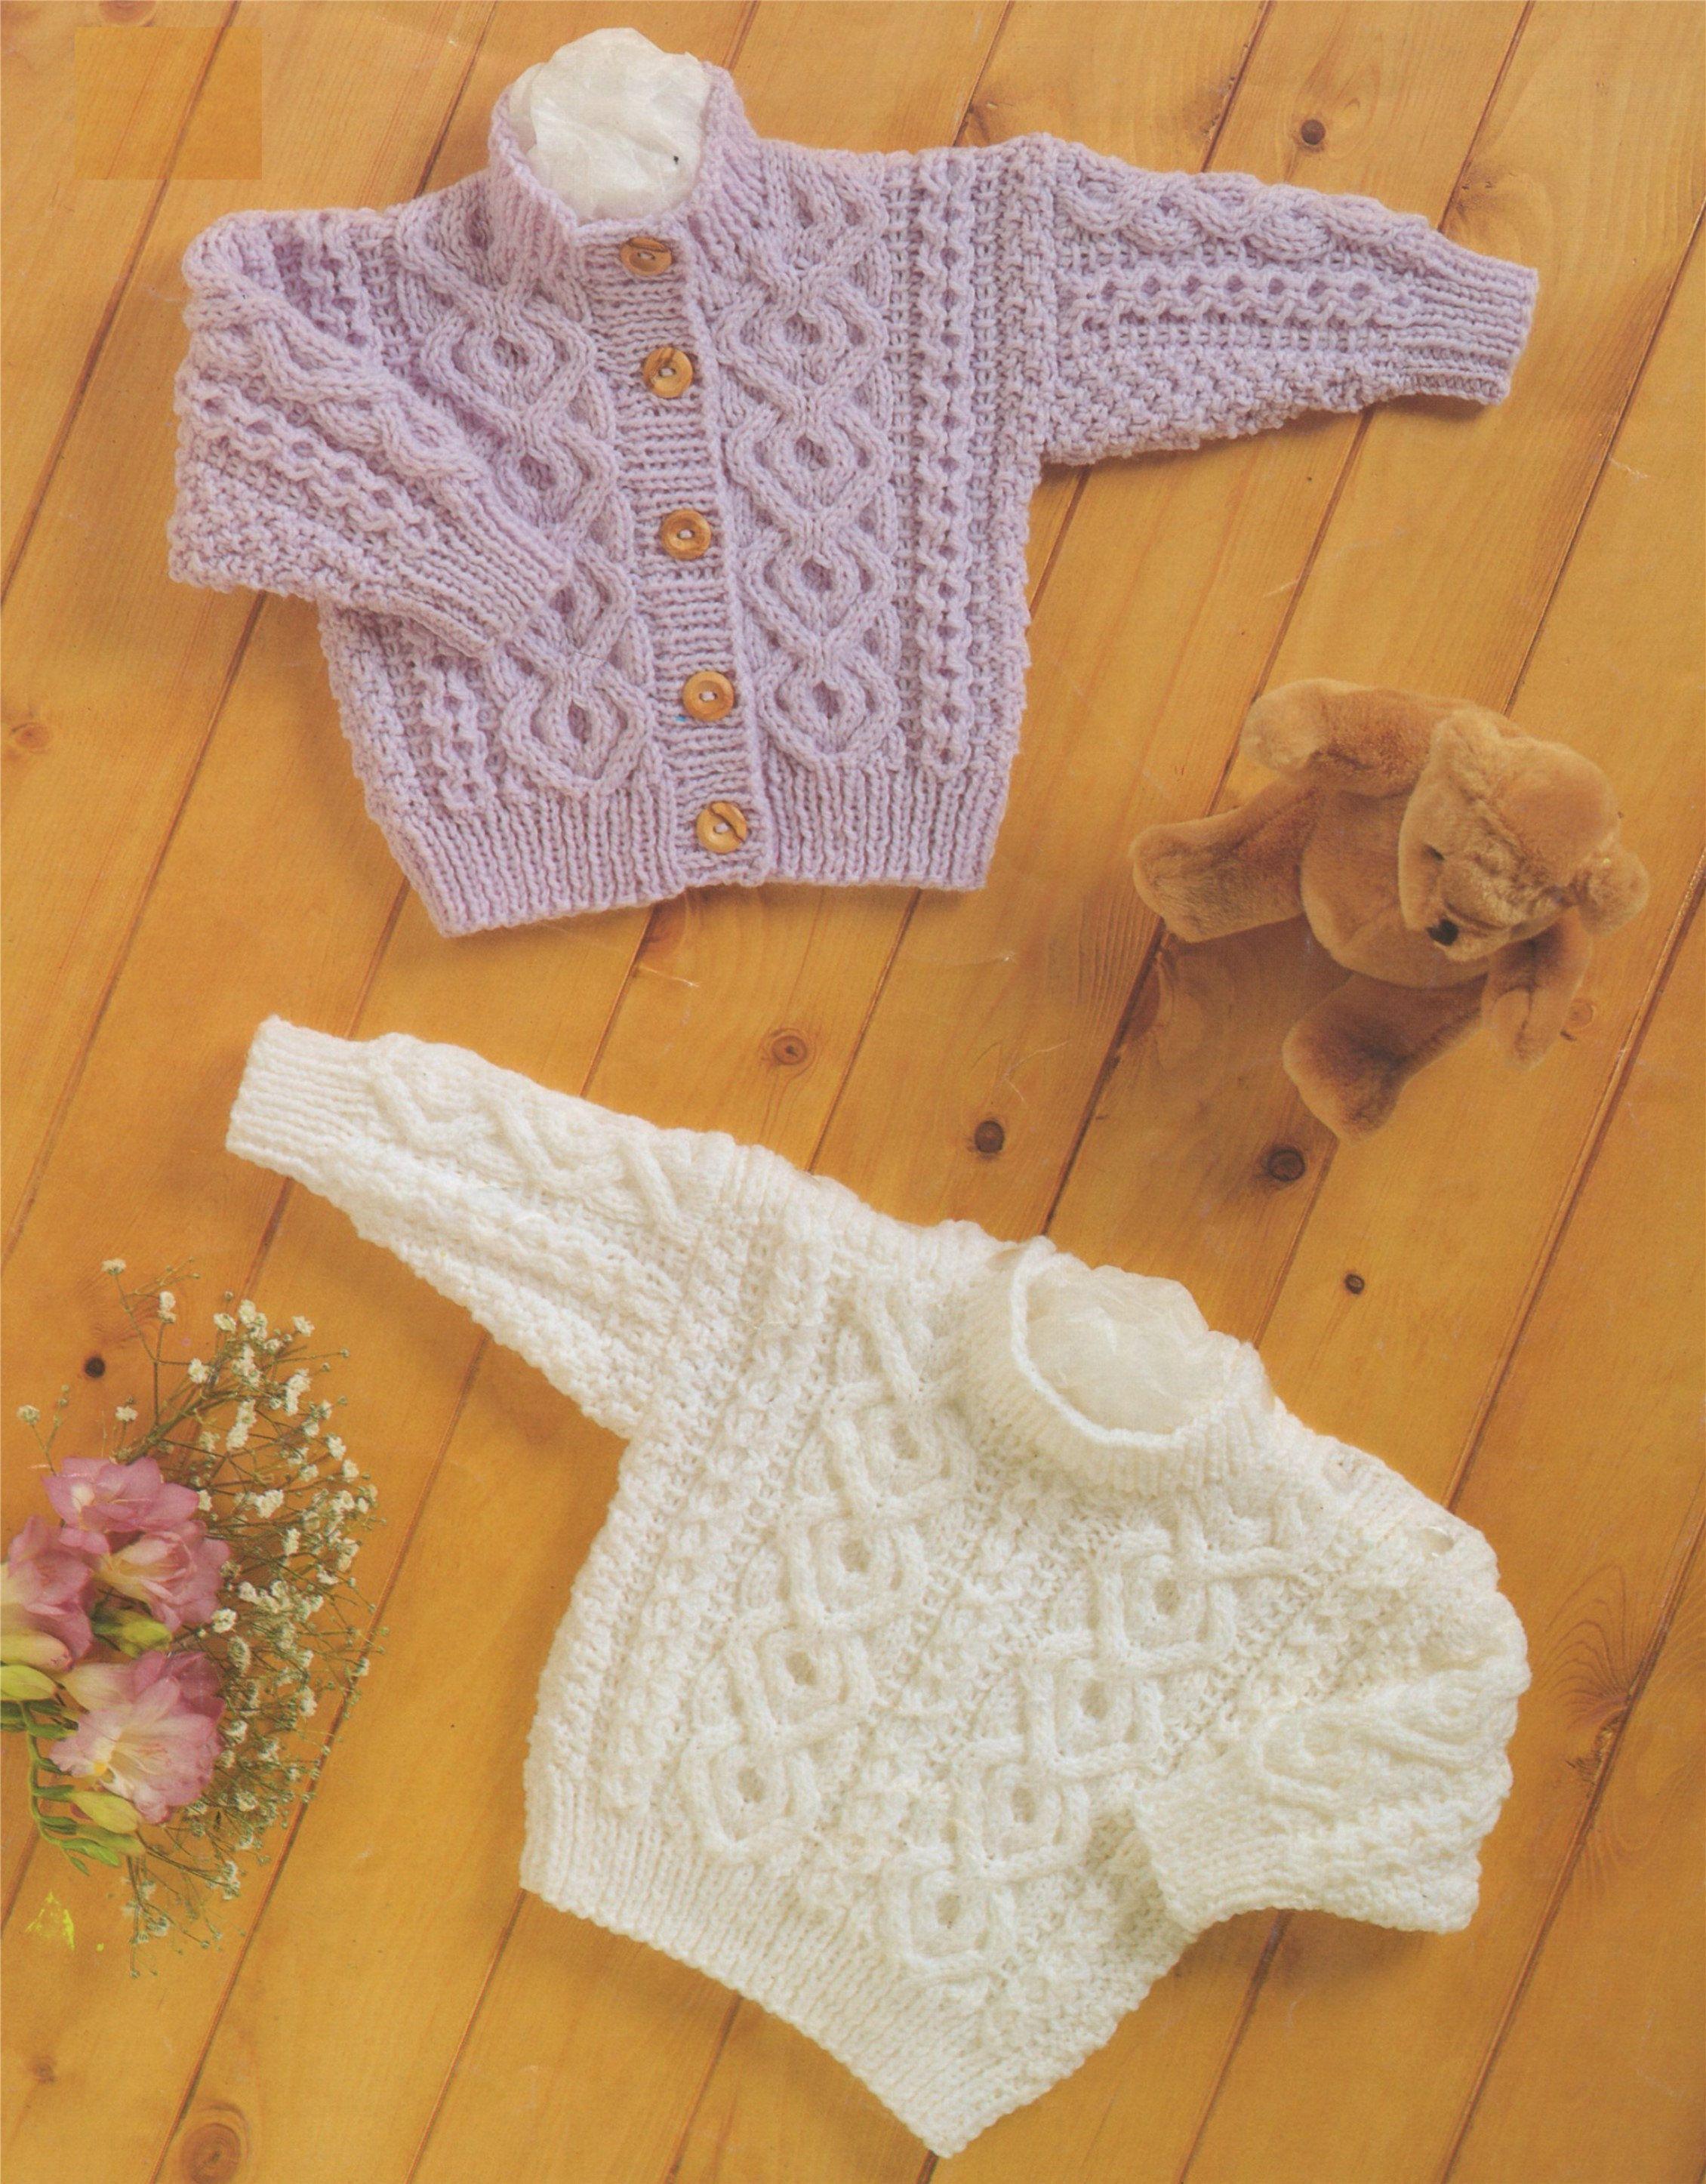 4b083b833 Baby Aran Cardigan and Sweater Knitting Pattern PDF Toddlers Boys or ...